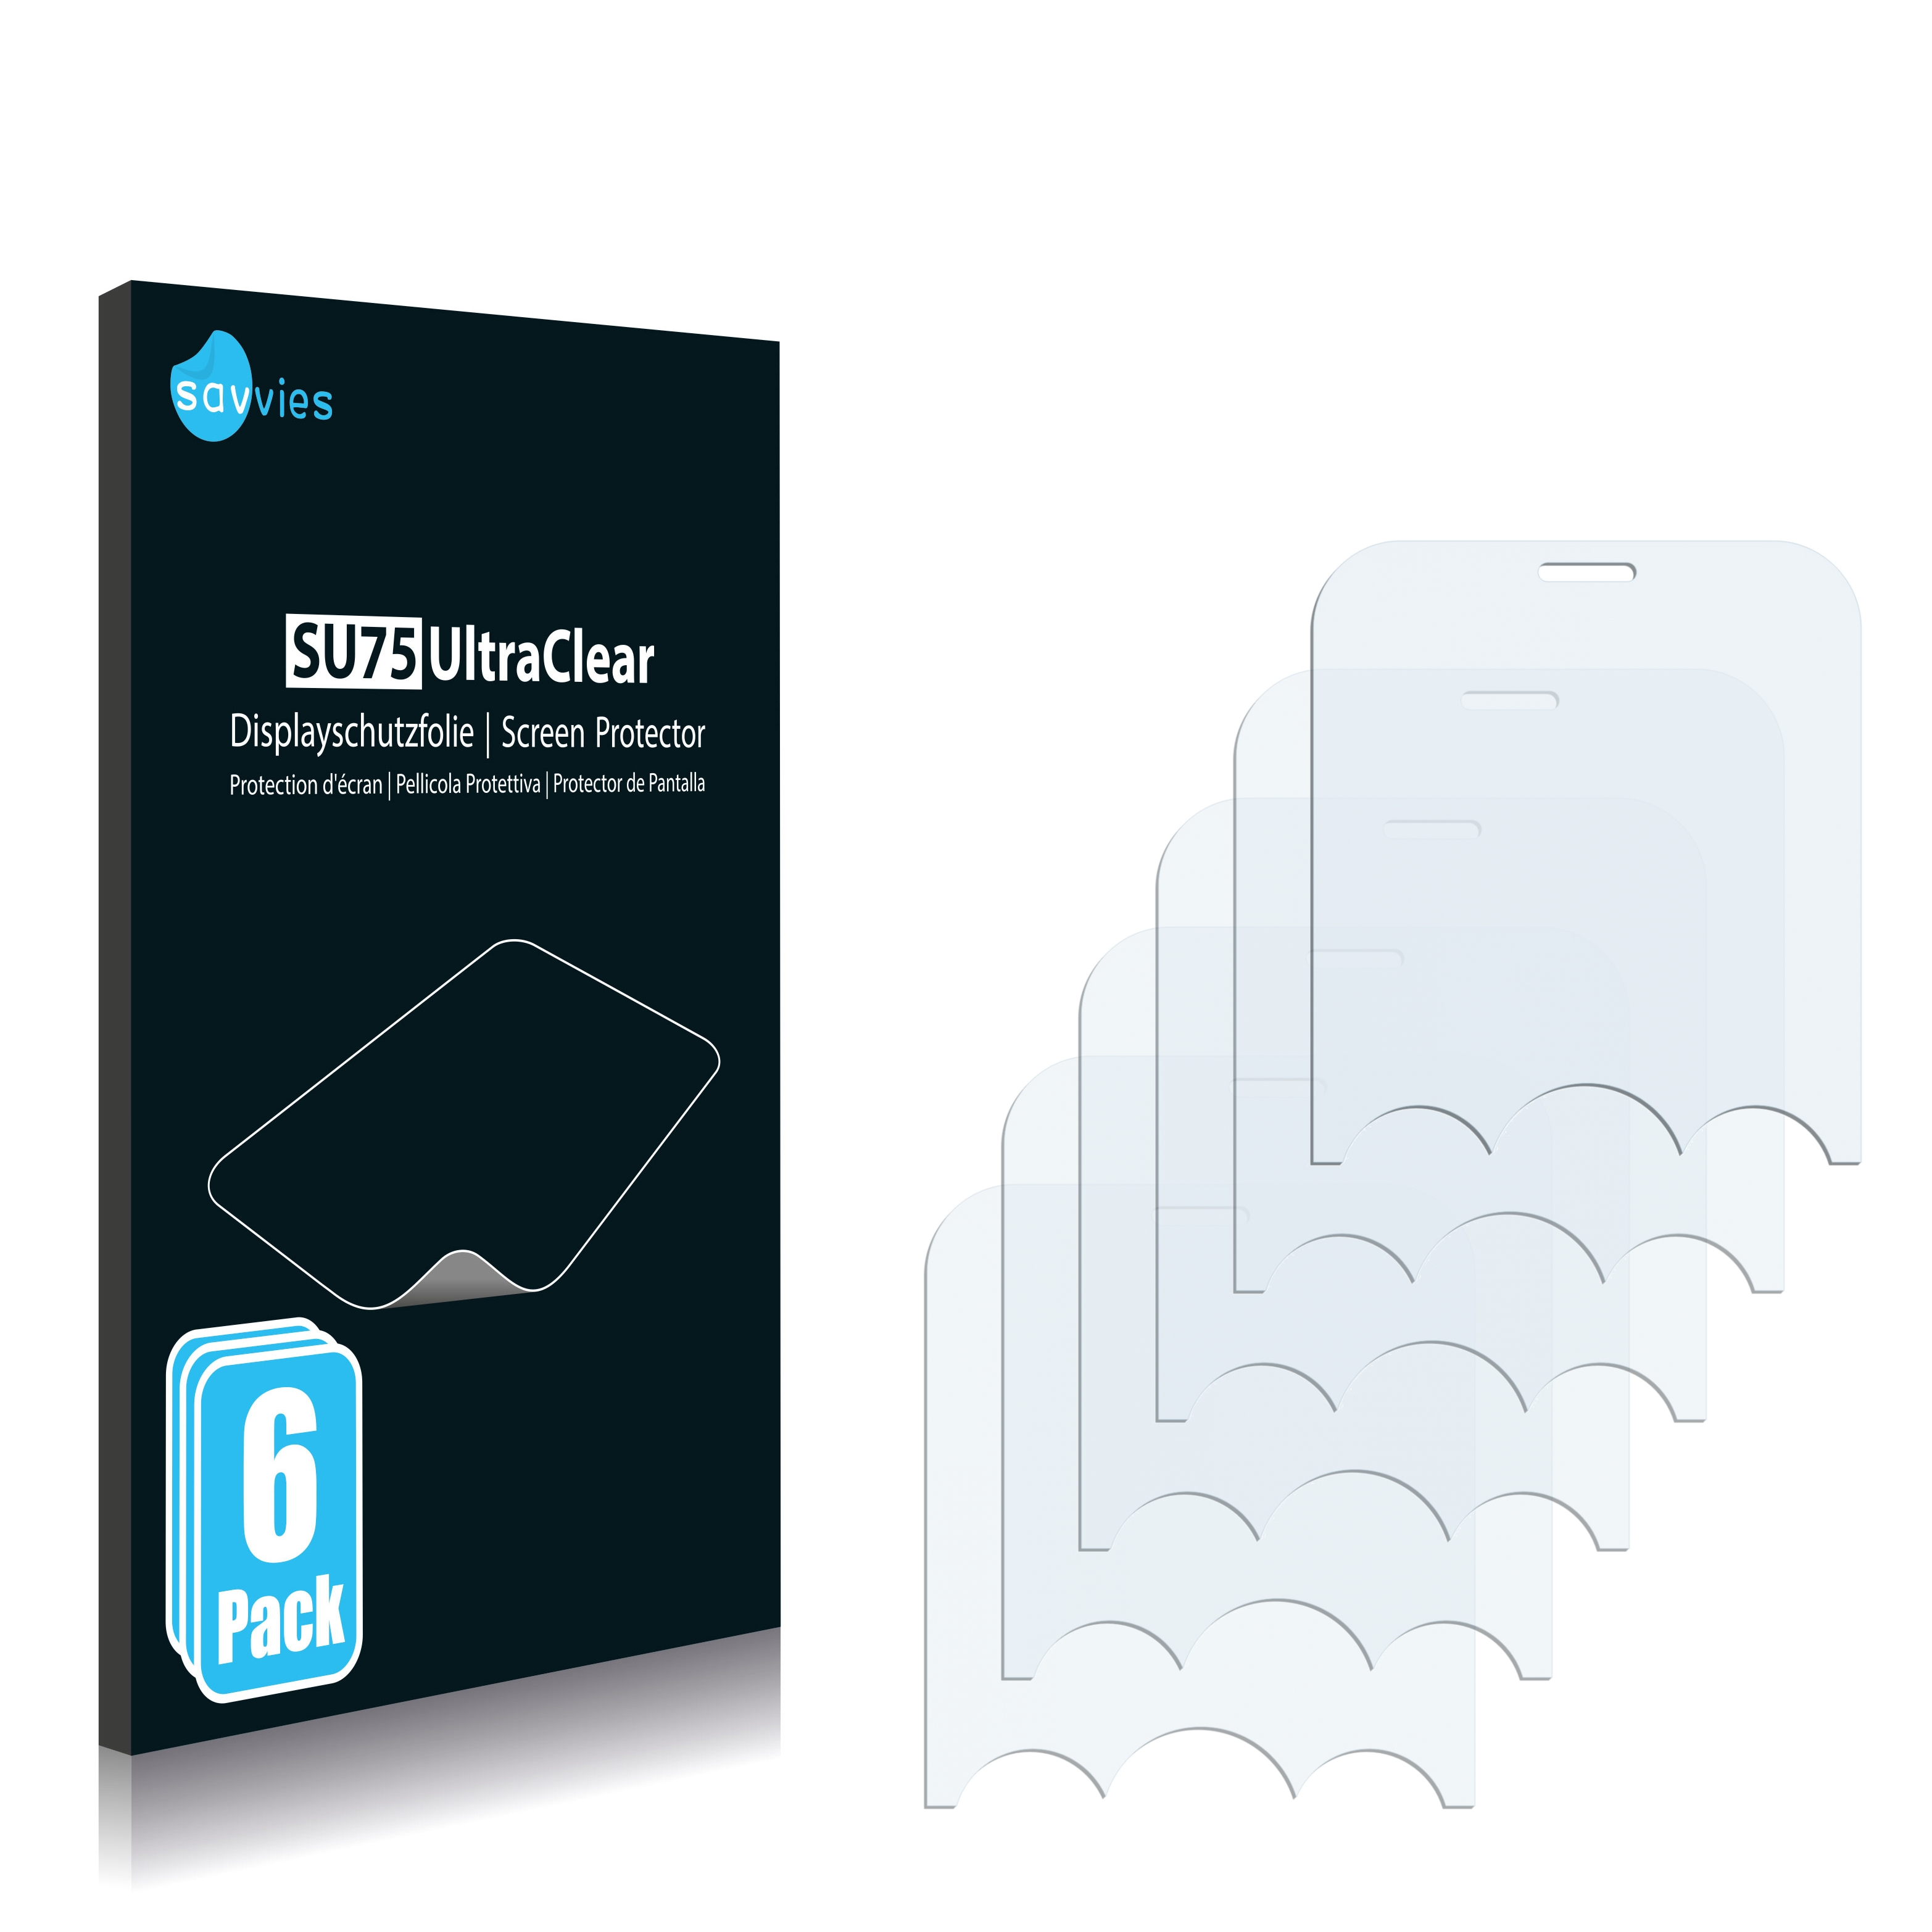 Ochranná fólie Savvies na LG Electronics GW300, 6ks